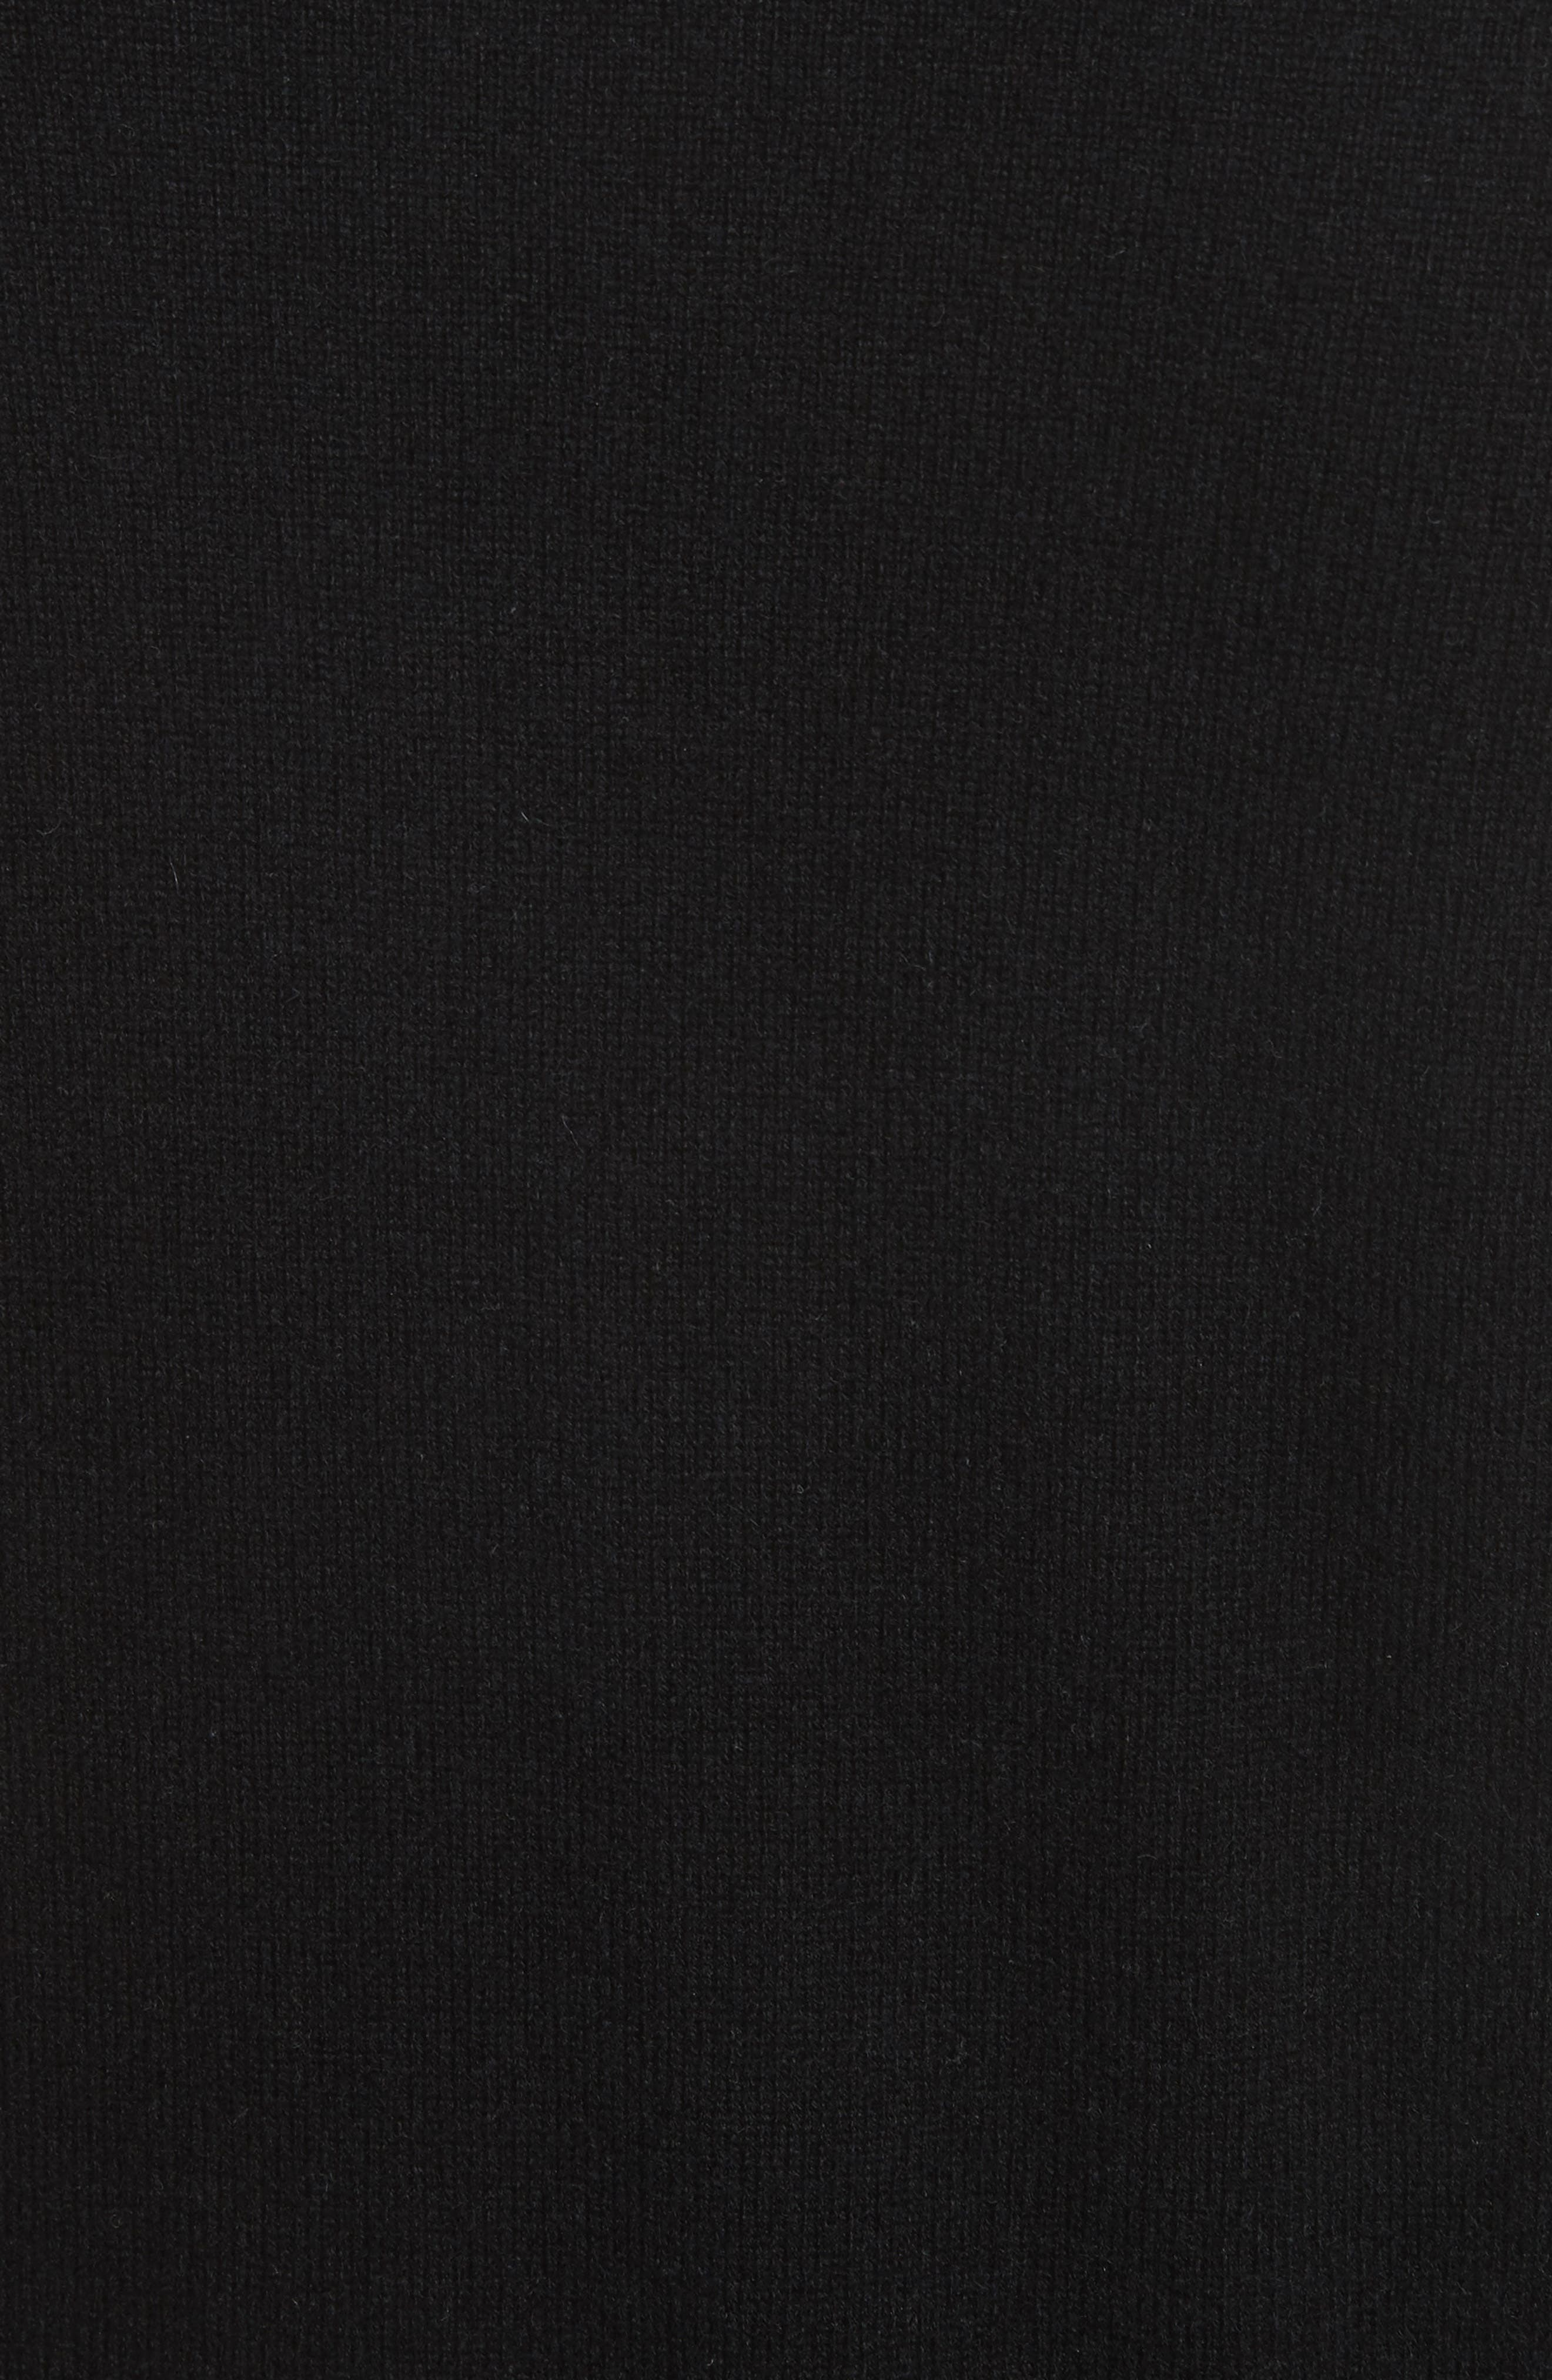 Zip Front Wool & Cashmere Blend Sweater,                             Alternate thumbnail 5, color,                             Black